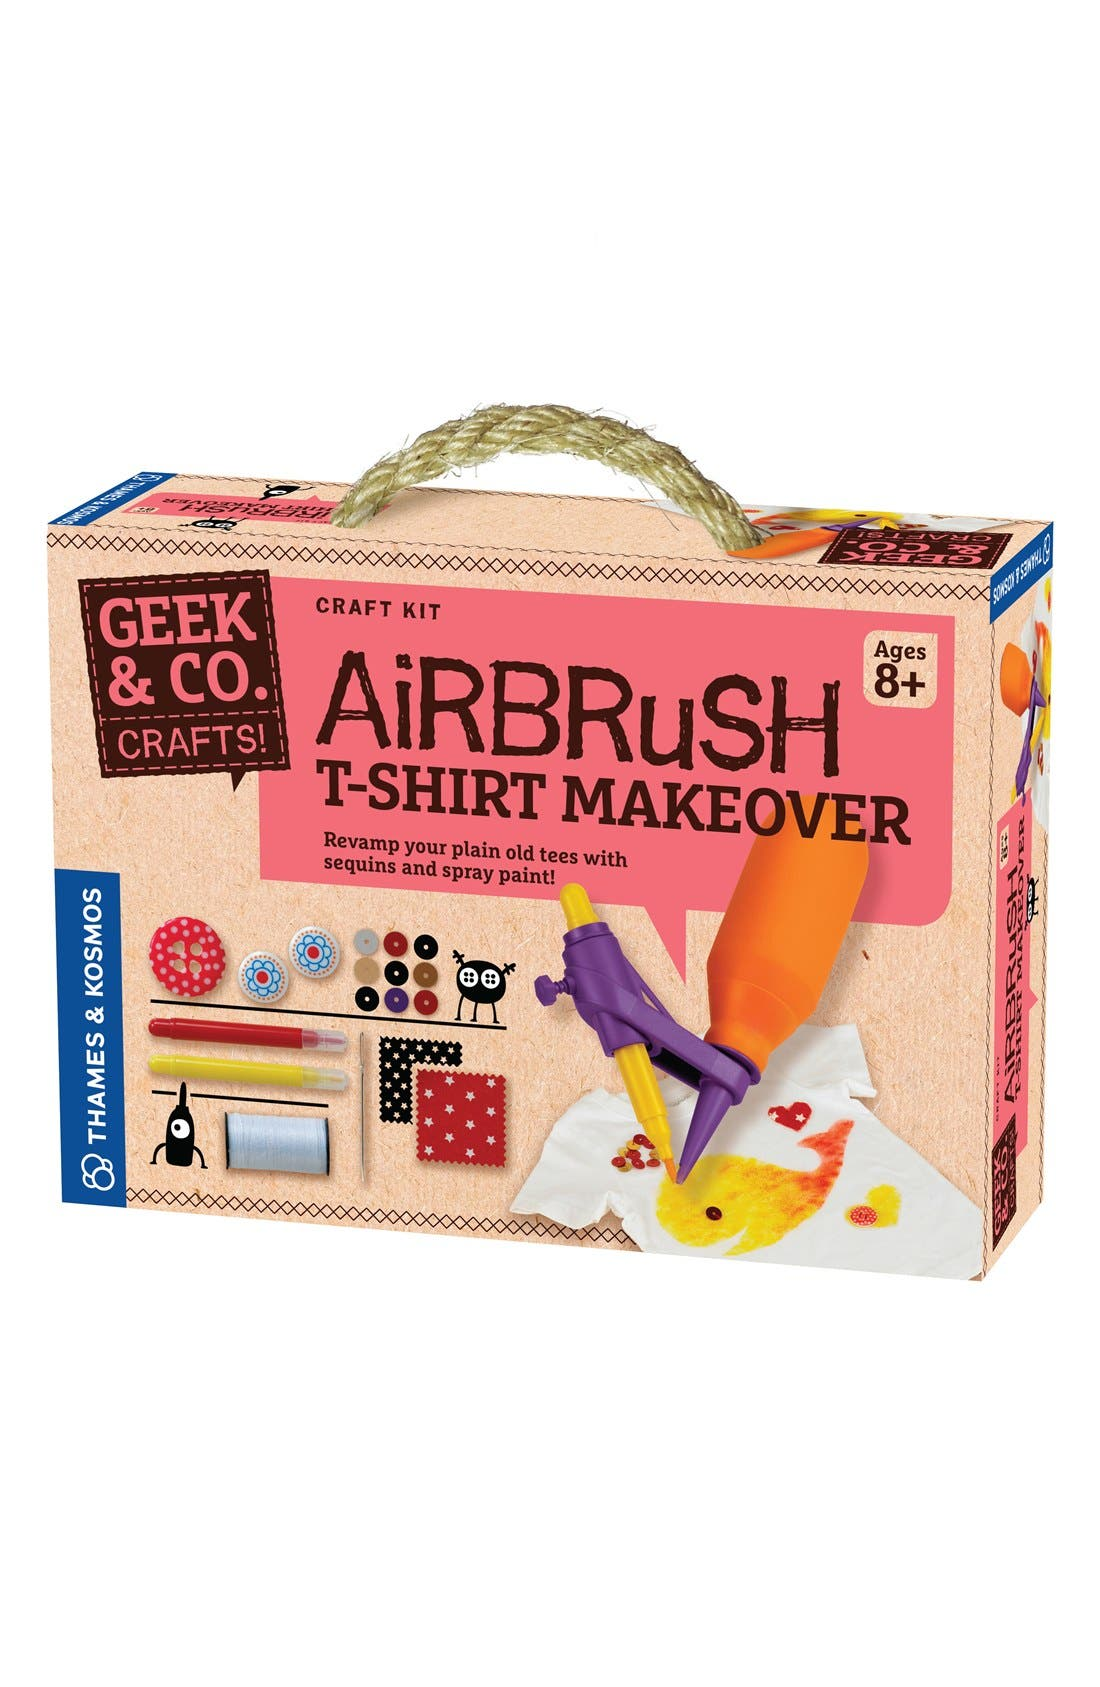 THAMES & KOSMOS 'Airbrush T-Shirt Makeover' Kit